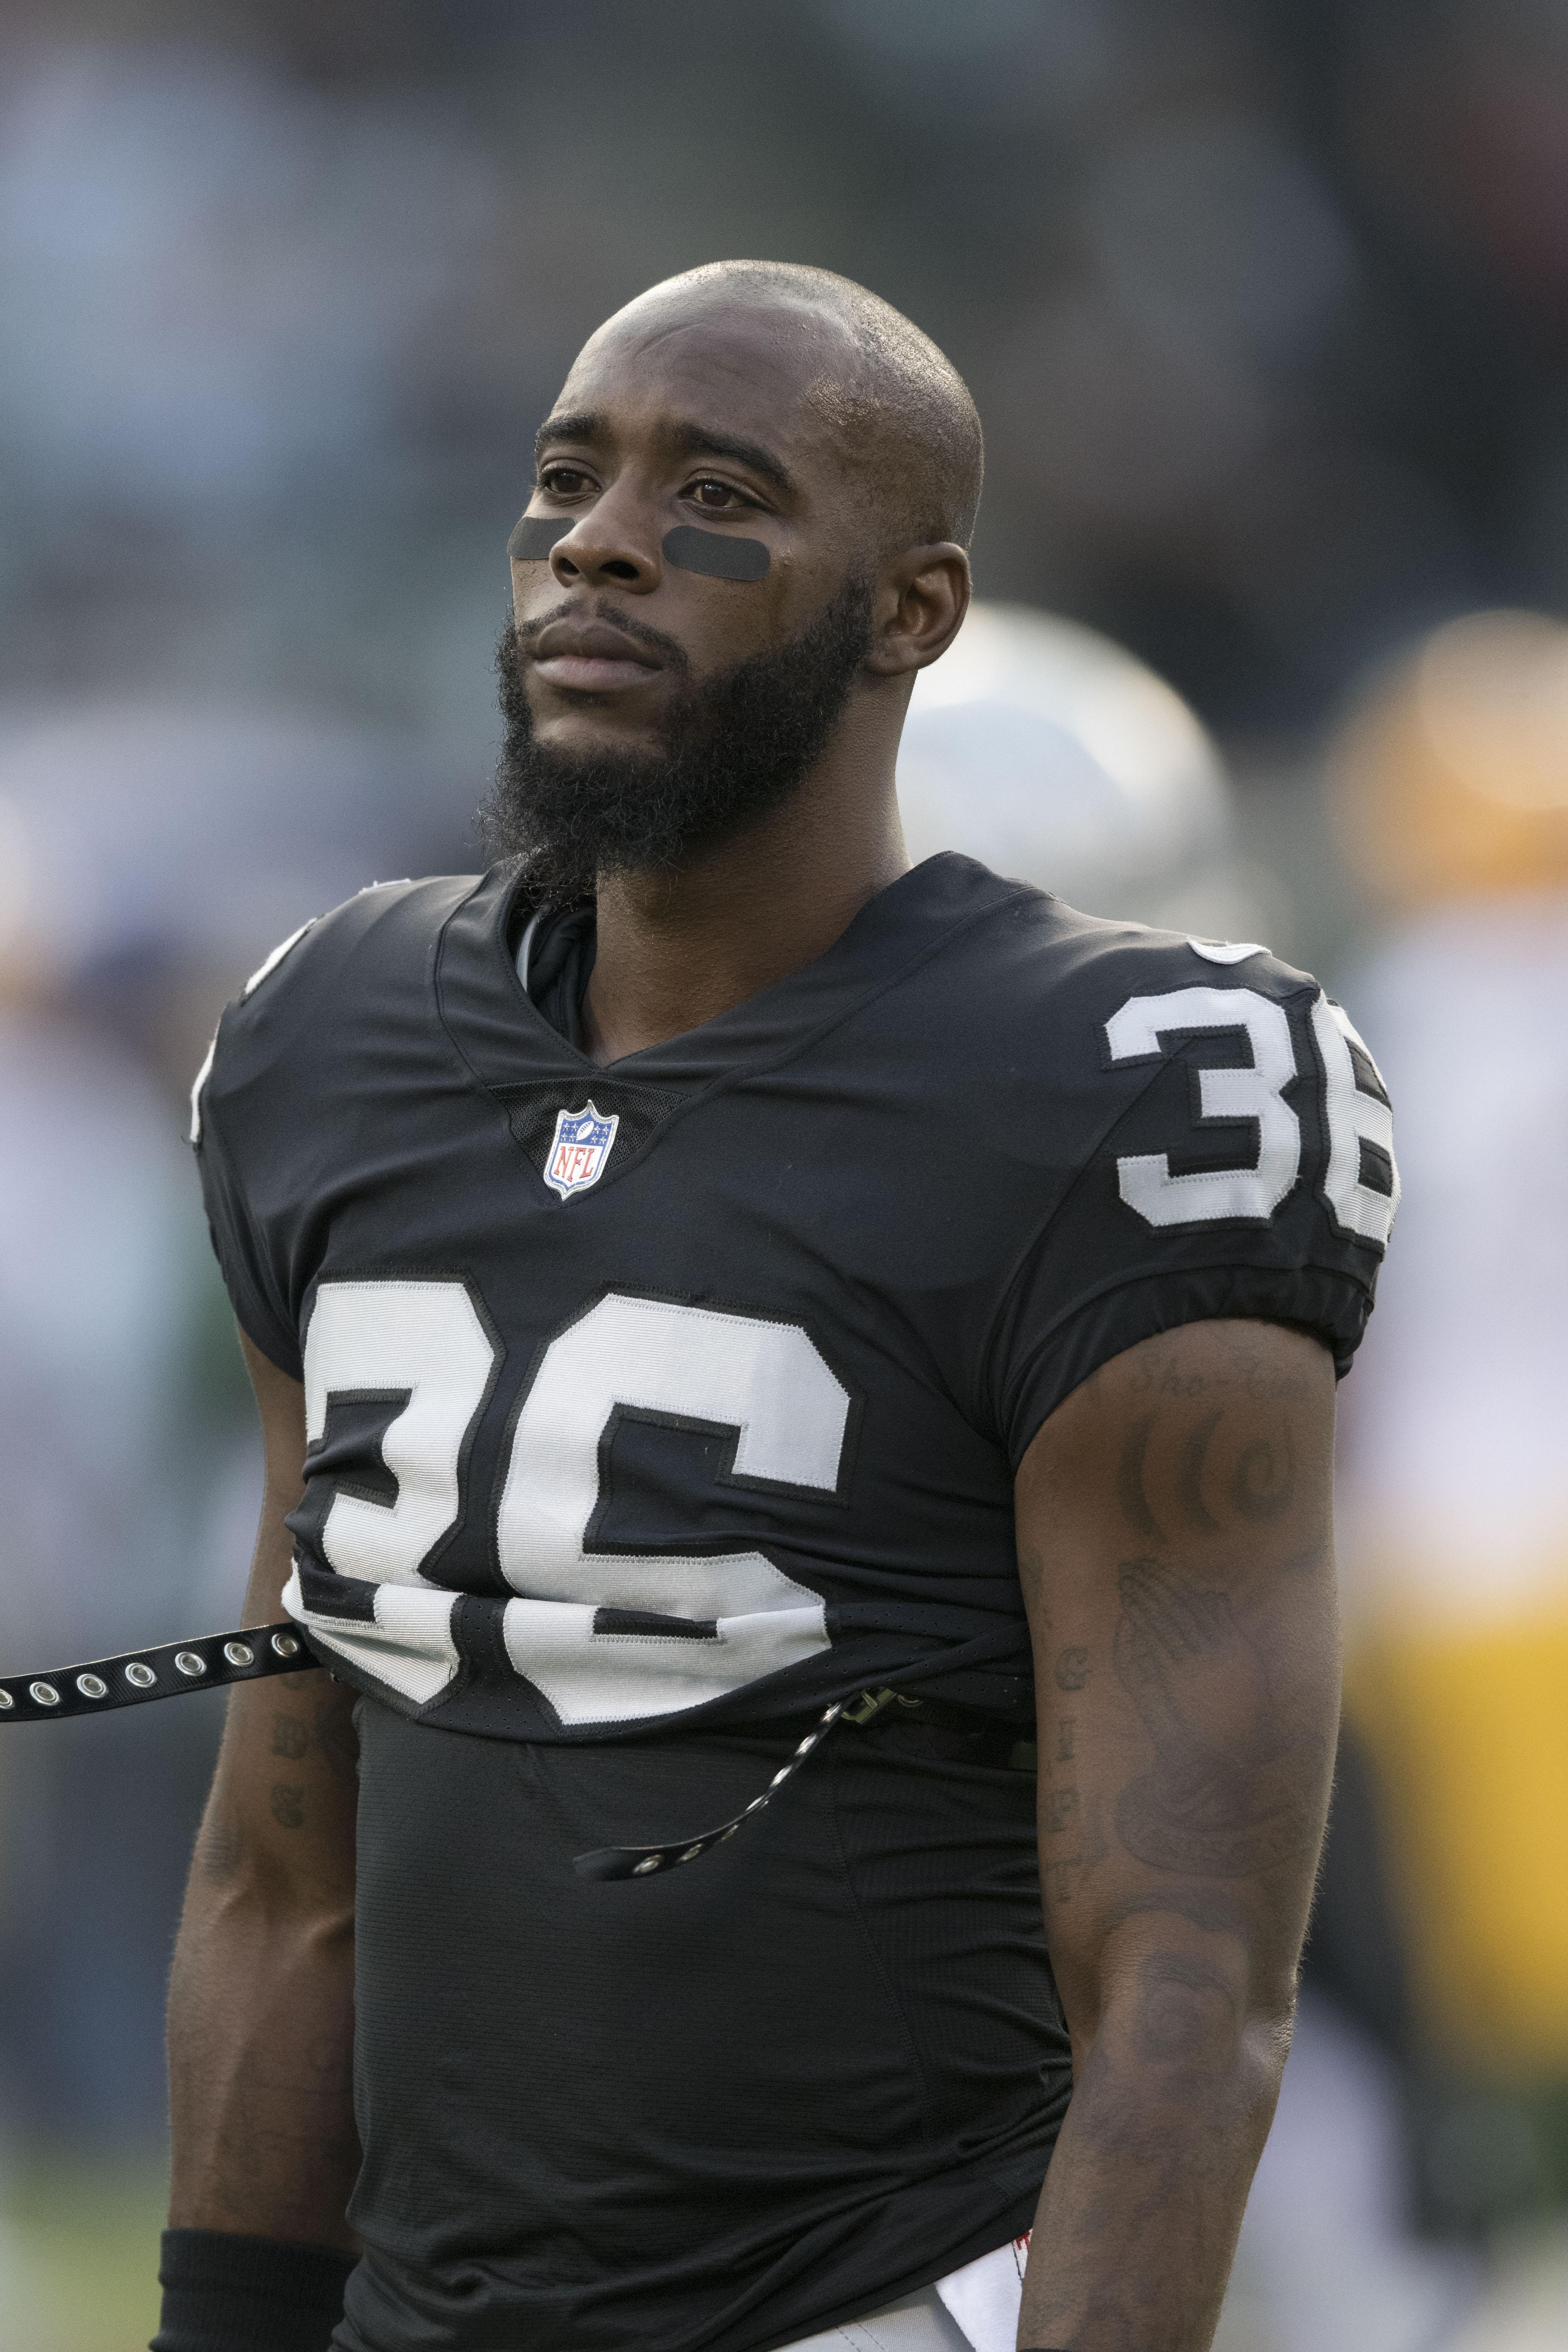 hot sale online 33a03 791e6 Raiders CB Dominique Rodgers-Cromartie Retires From NFL